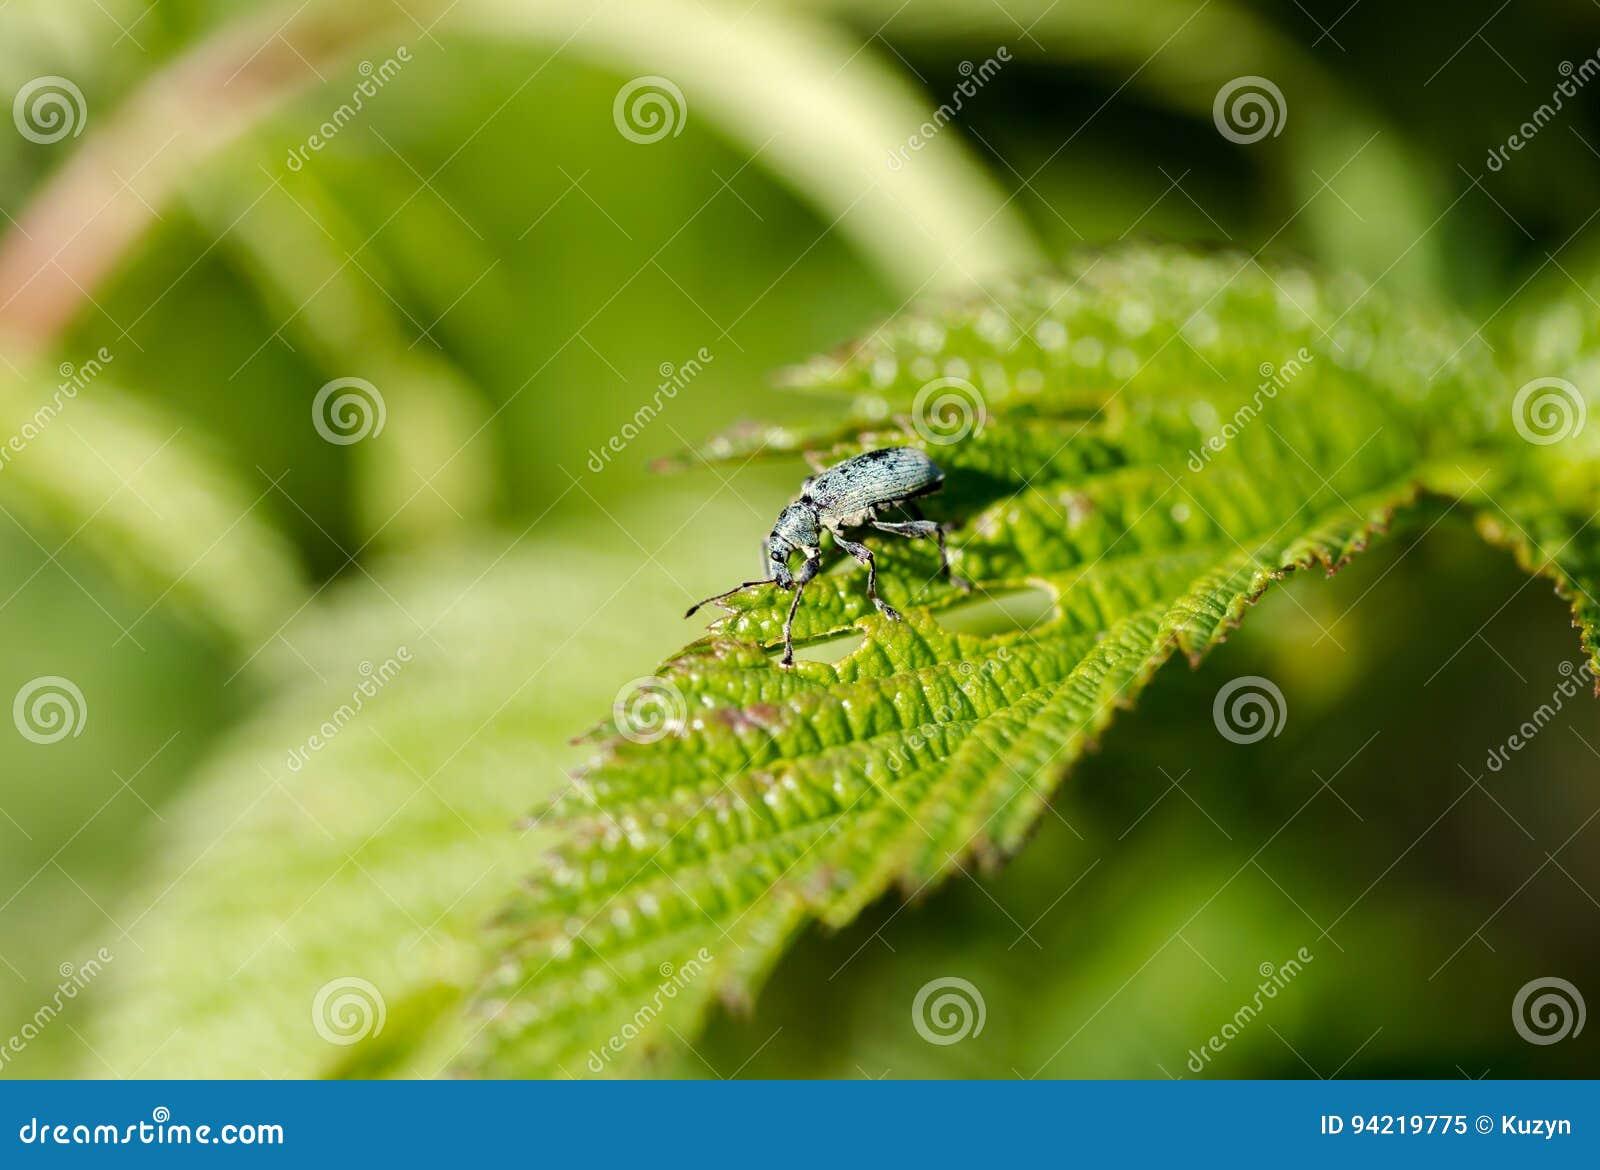 A praga do jardim, Otiorhynchus, come a folha verde, macro